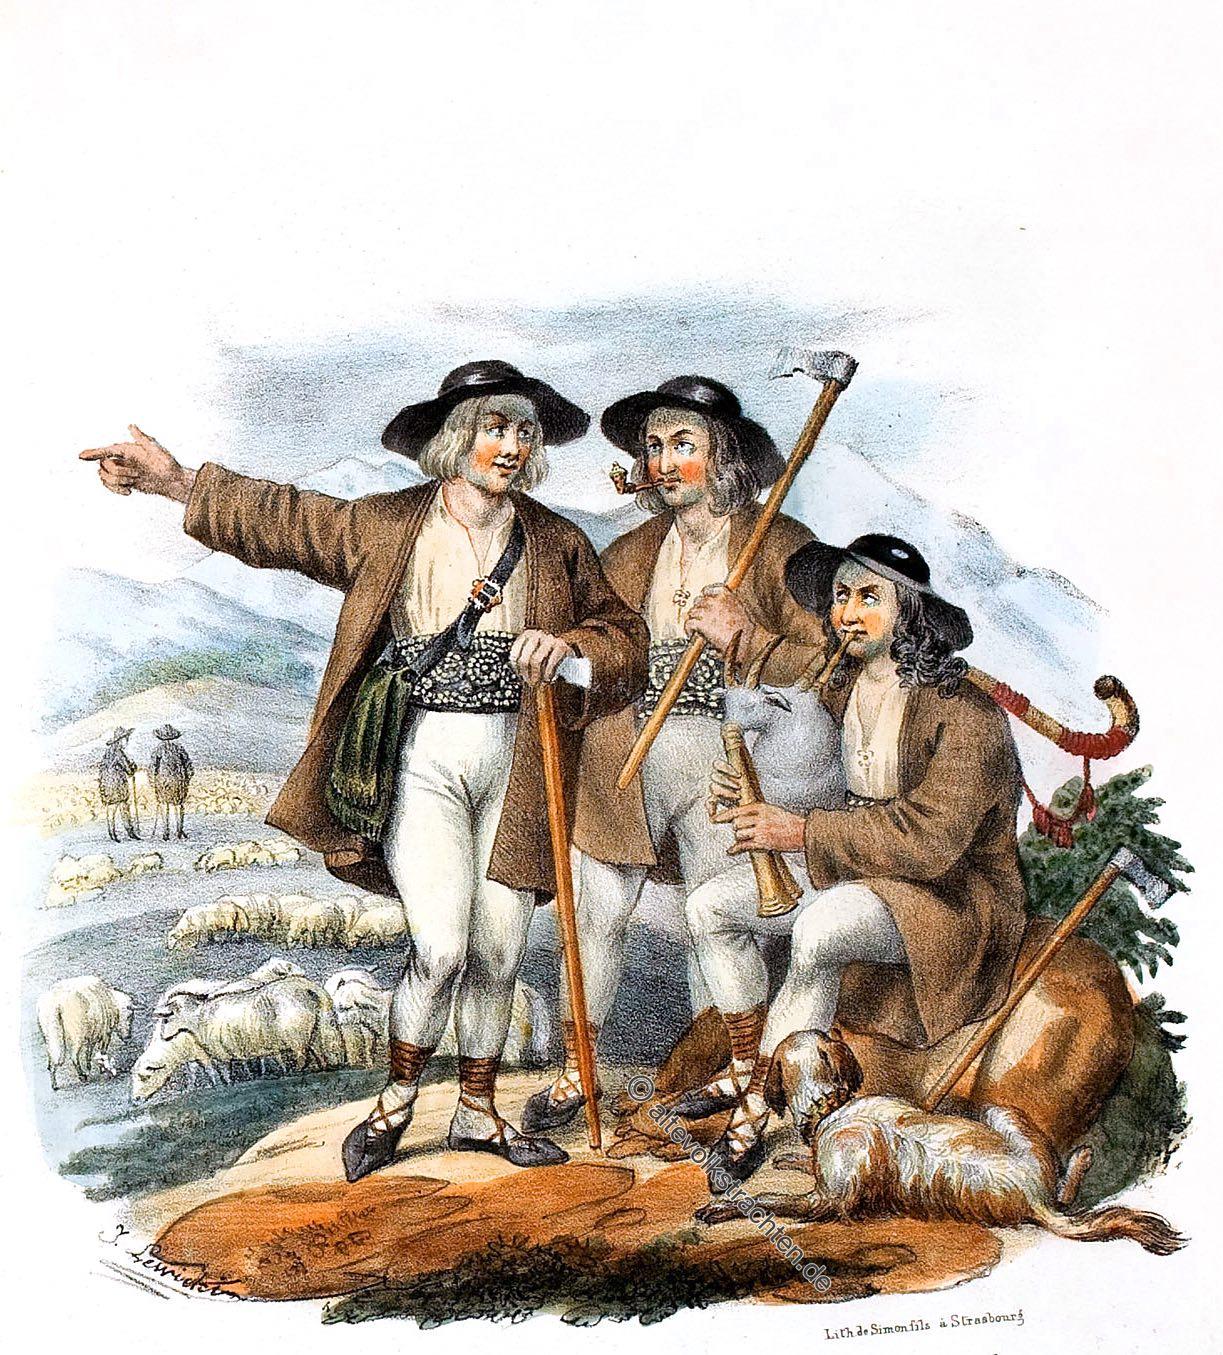 Goralen, Górale, Hirten, Trachten, Karpaten, pasterstwie, Przedgórze, karpaccy,